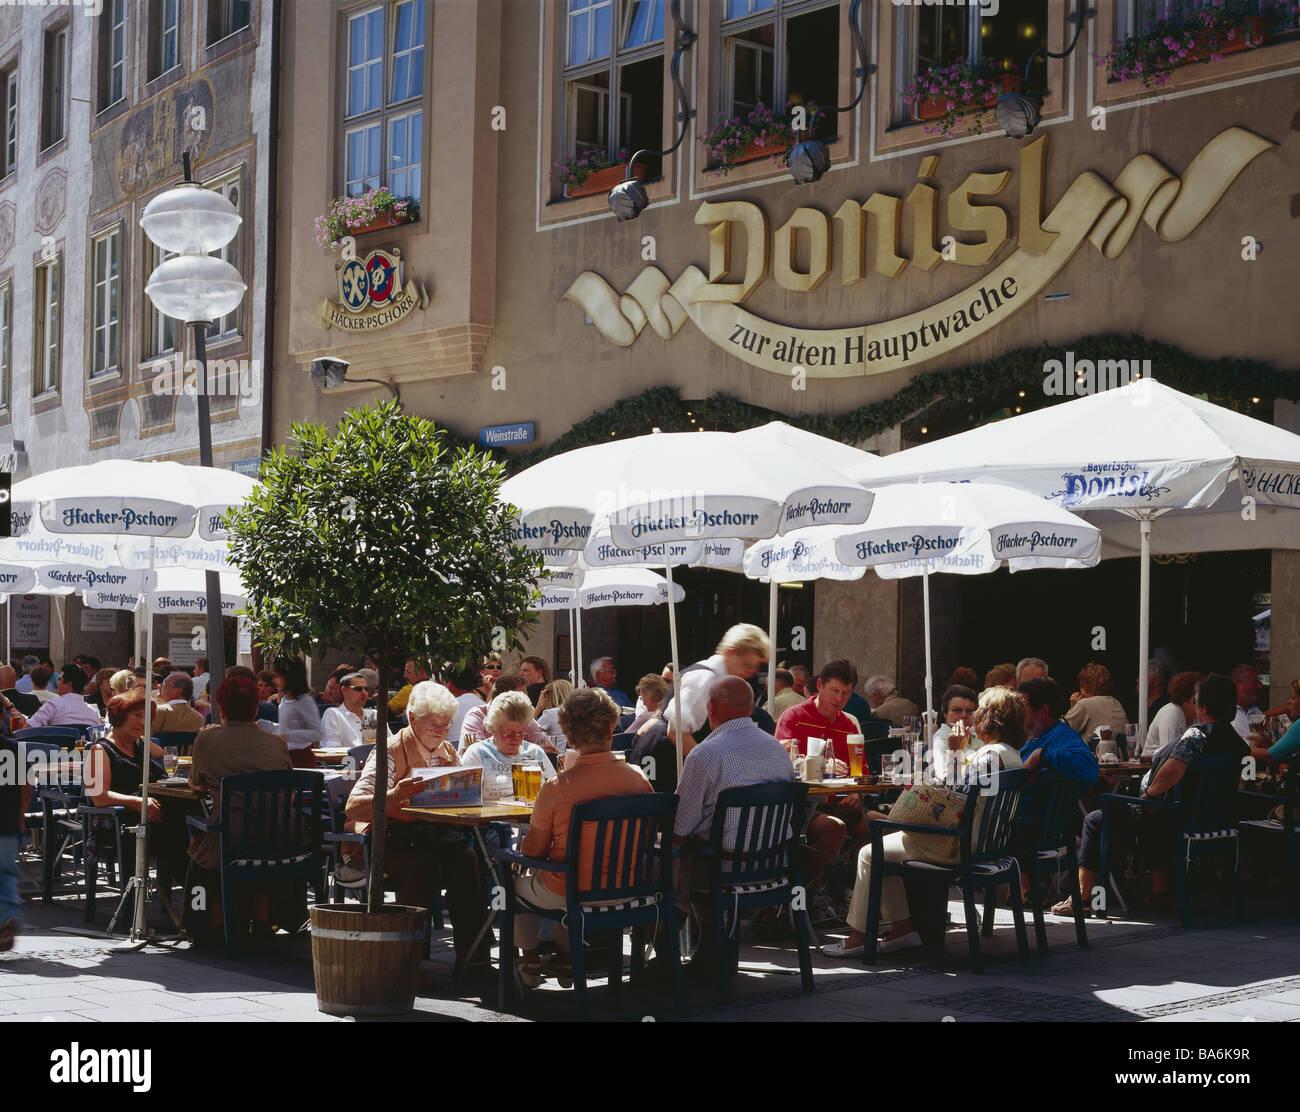 Germany waiter-Bavaria models Munich Marie-place street-cafe Donisl guests no release Bavaria sociability symbol - Stock Image